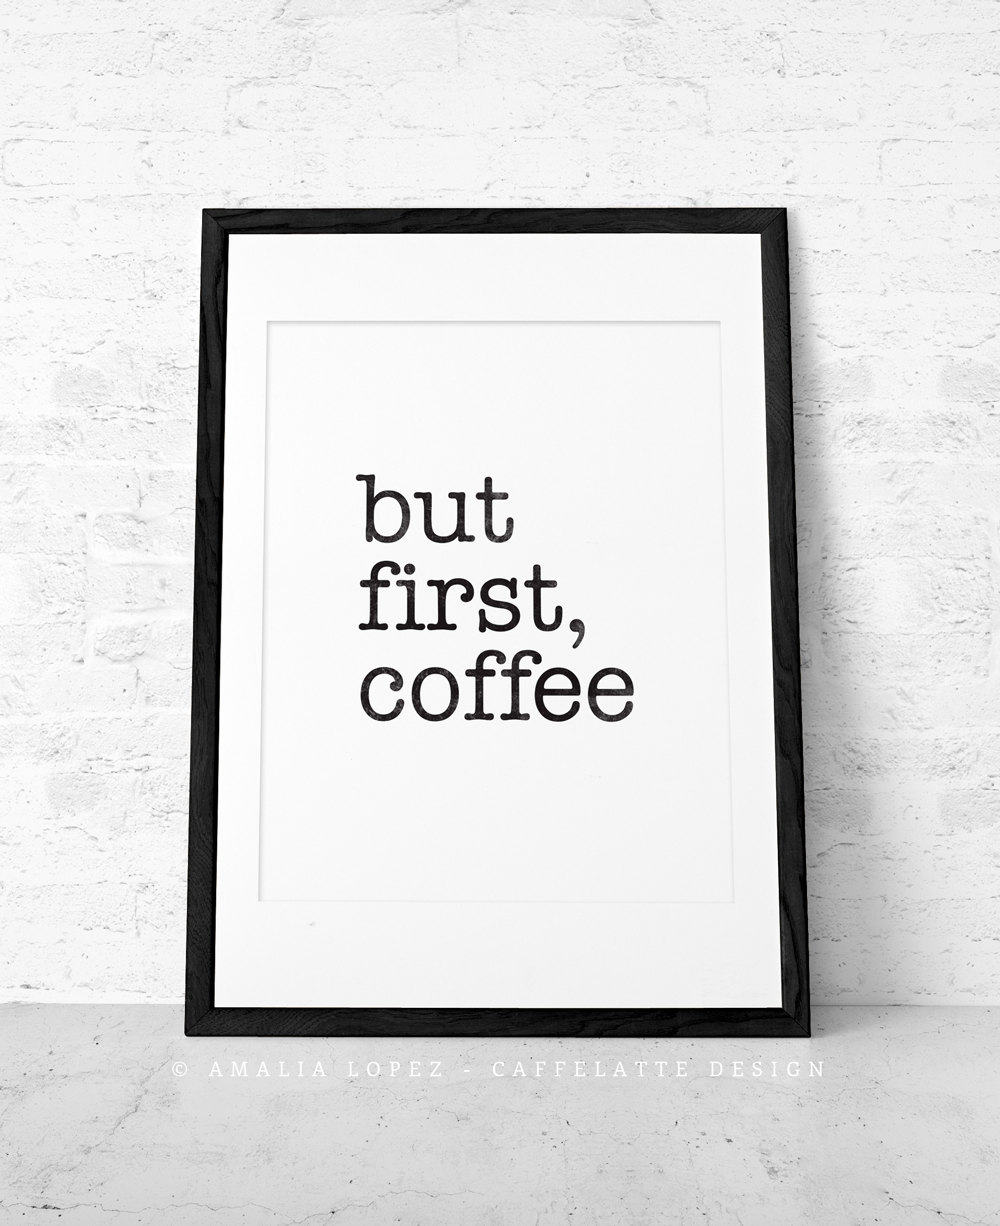 https://www.etsy.com/de/listing/165508731/aber-den-ersten-kaffee-kaffee-print